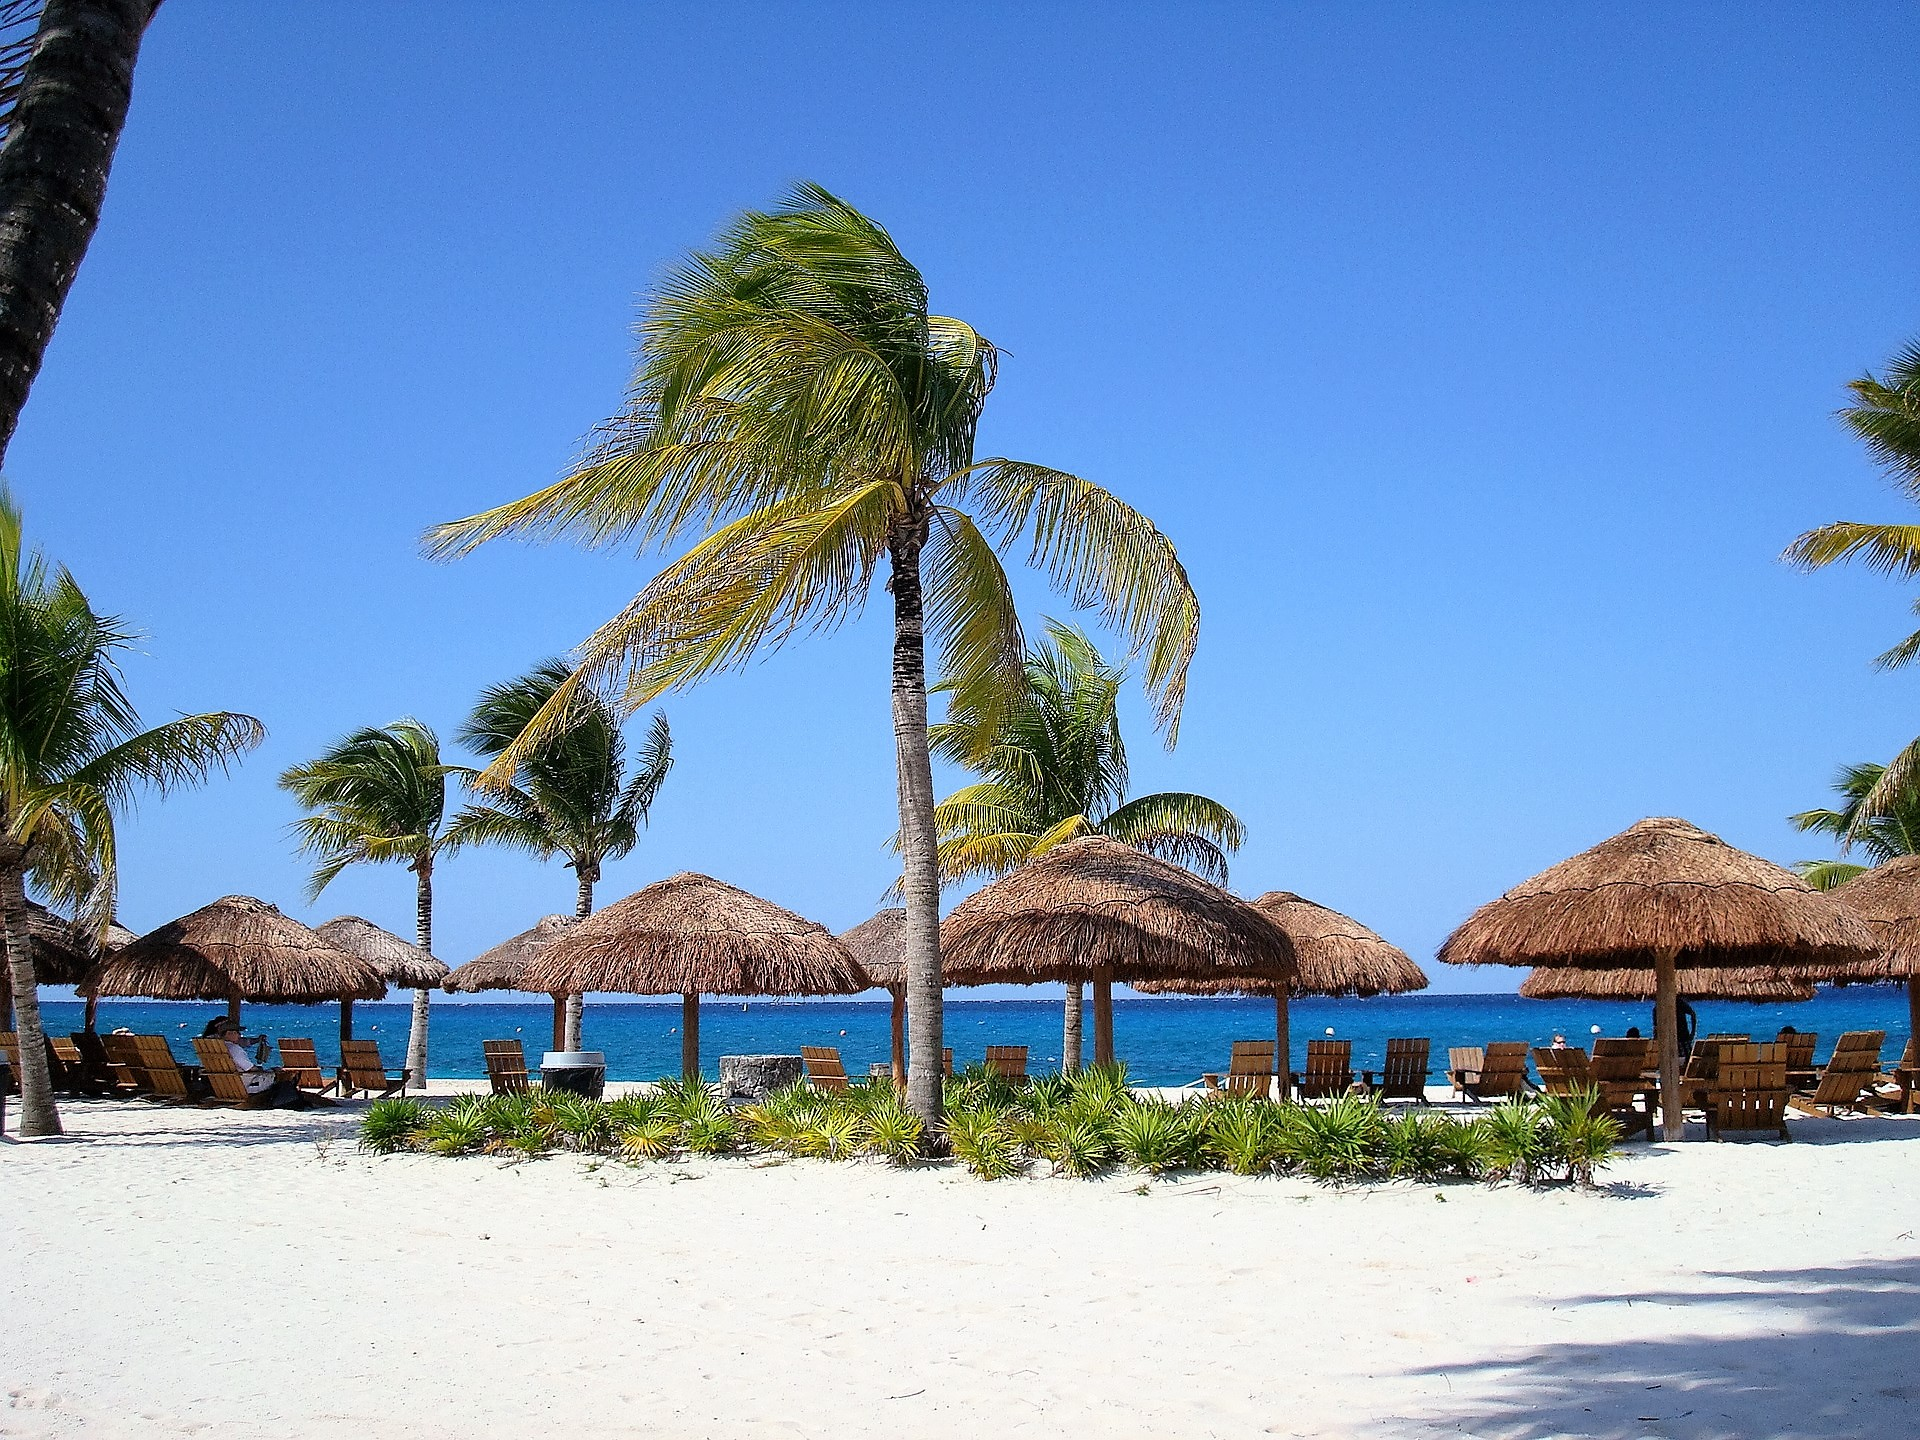 Cozumel My Cozumel beach clubs